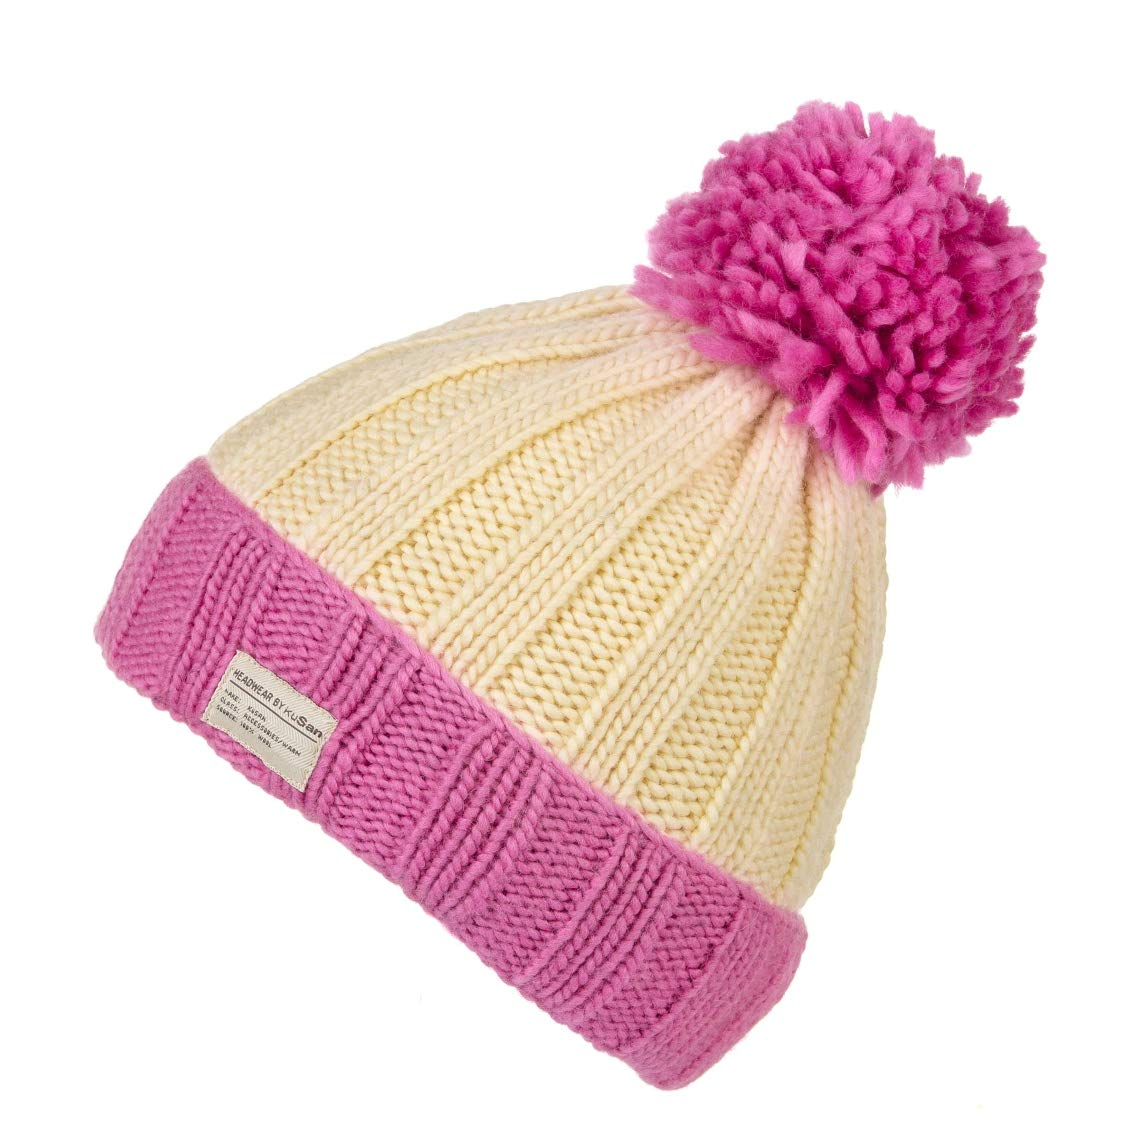 15c39b9a Kusan Moss Yarn Turn Up Bobble Beanie Hat (PK1525)